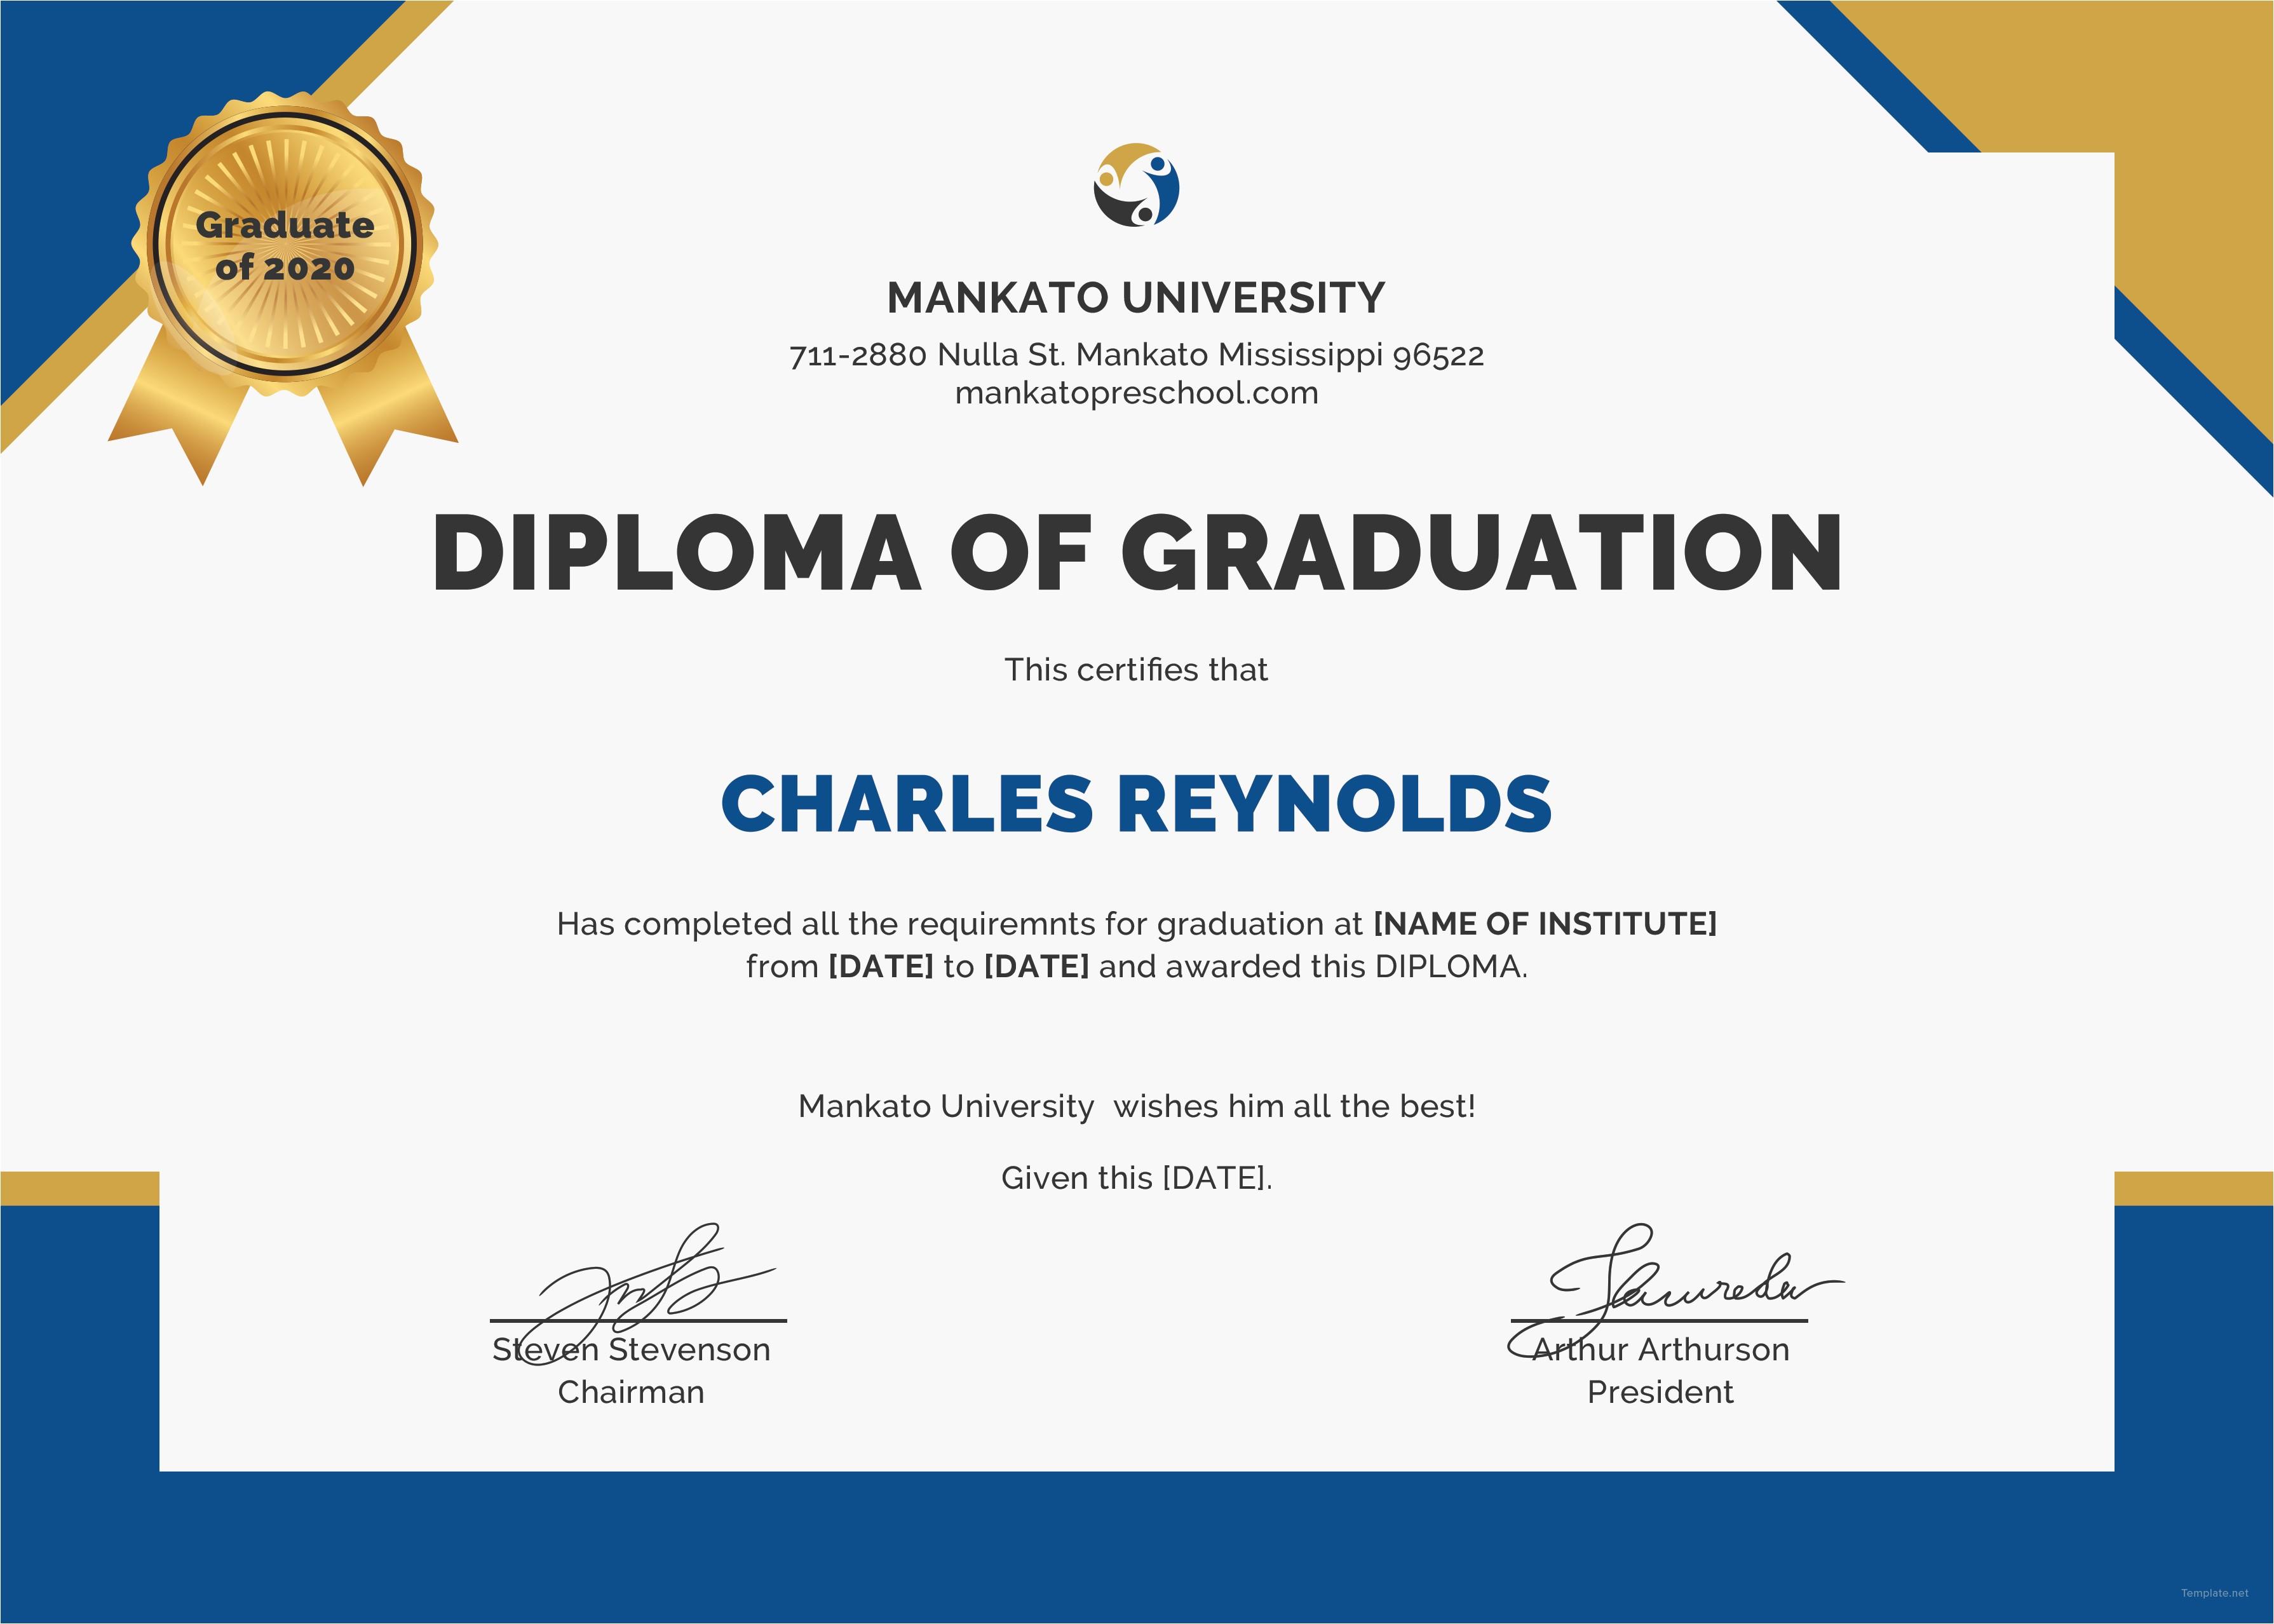 Templates for Graduation Certificates Free Diploma Of Graduation Certificate Template In Psd Ms